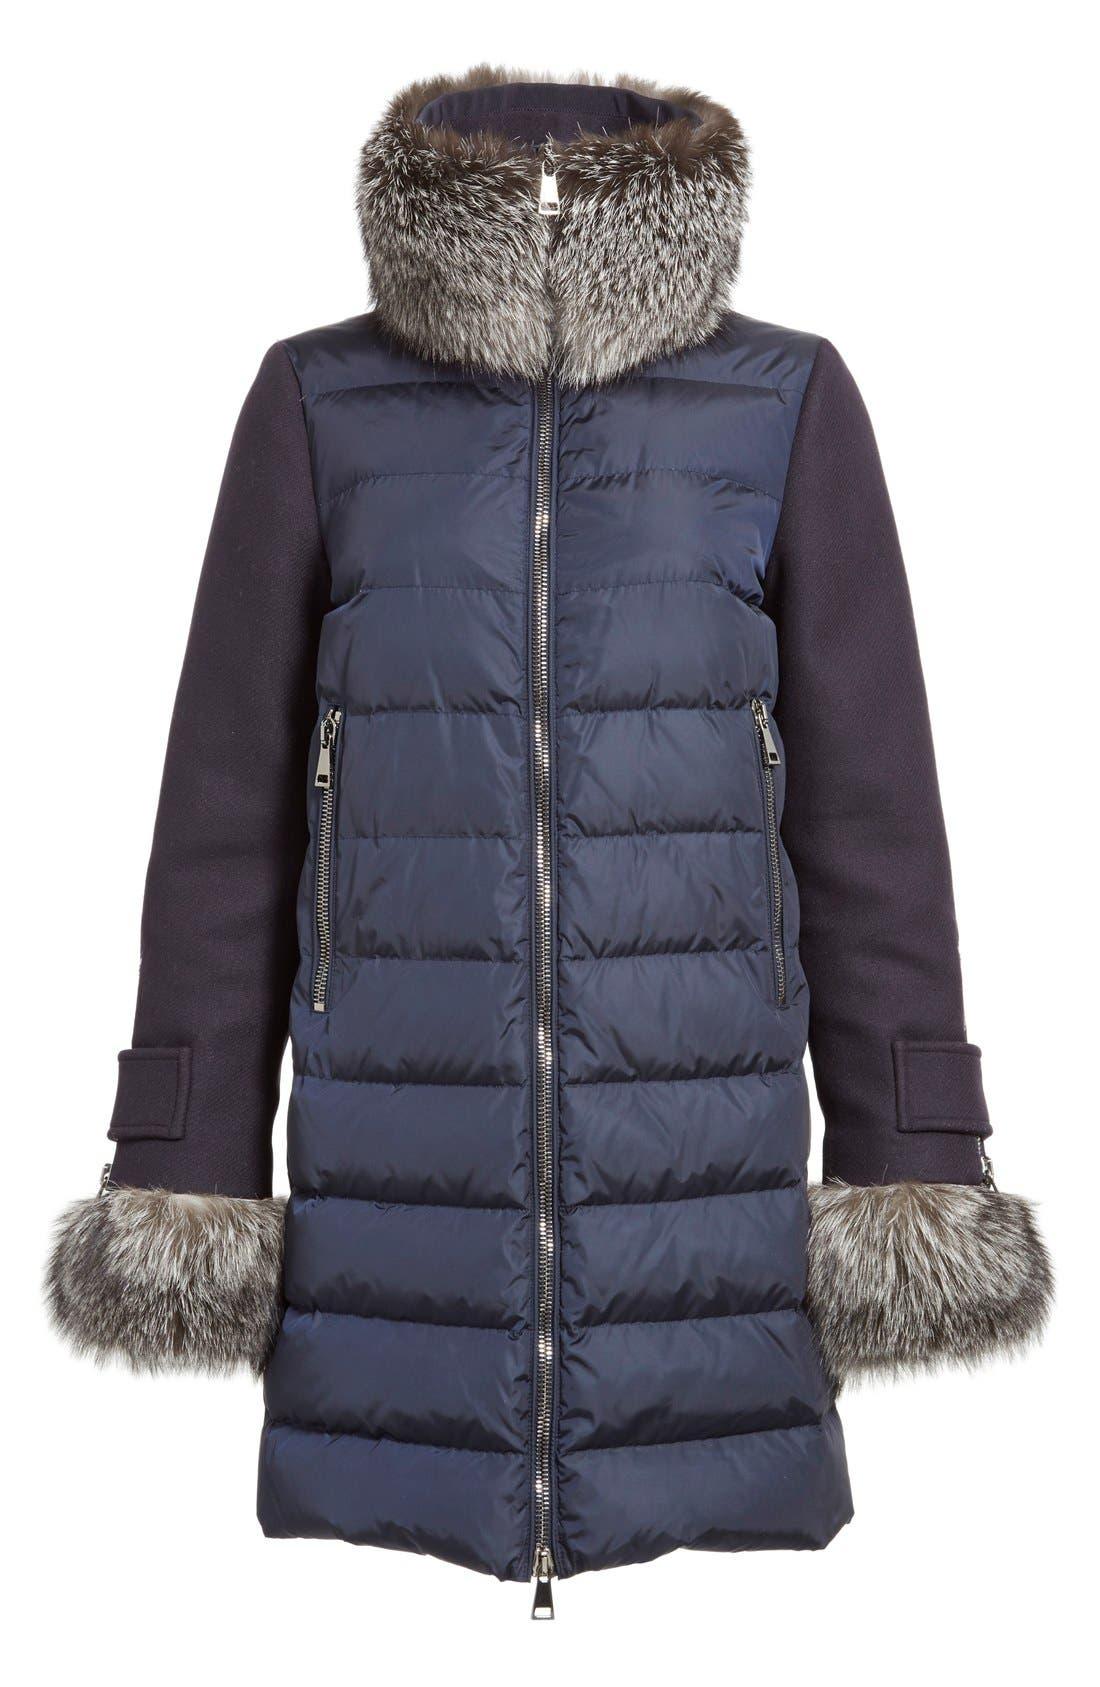 'Elestoria' Two-Piece Down Puffer Coat with Genuine Fox Fur Trim,                             Alternate thumbnail 11, color,                             419